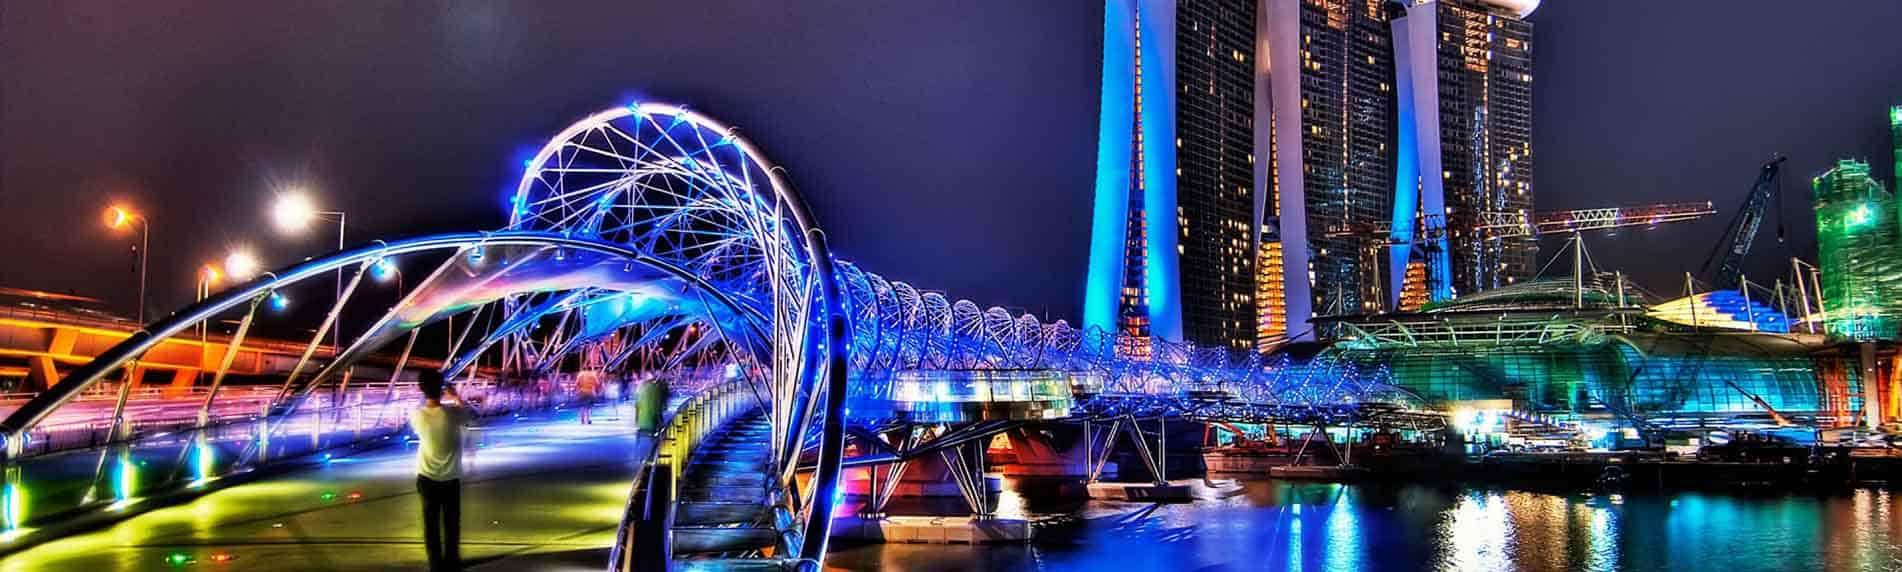 6 nights Scenic Singapore